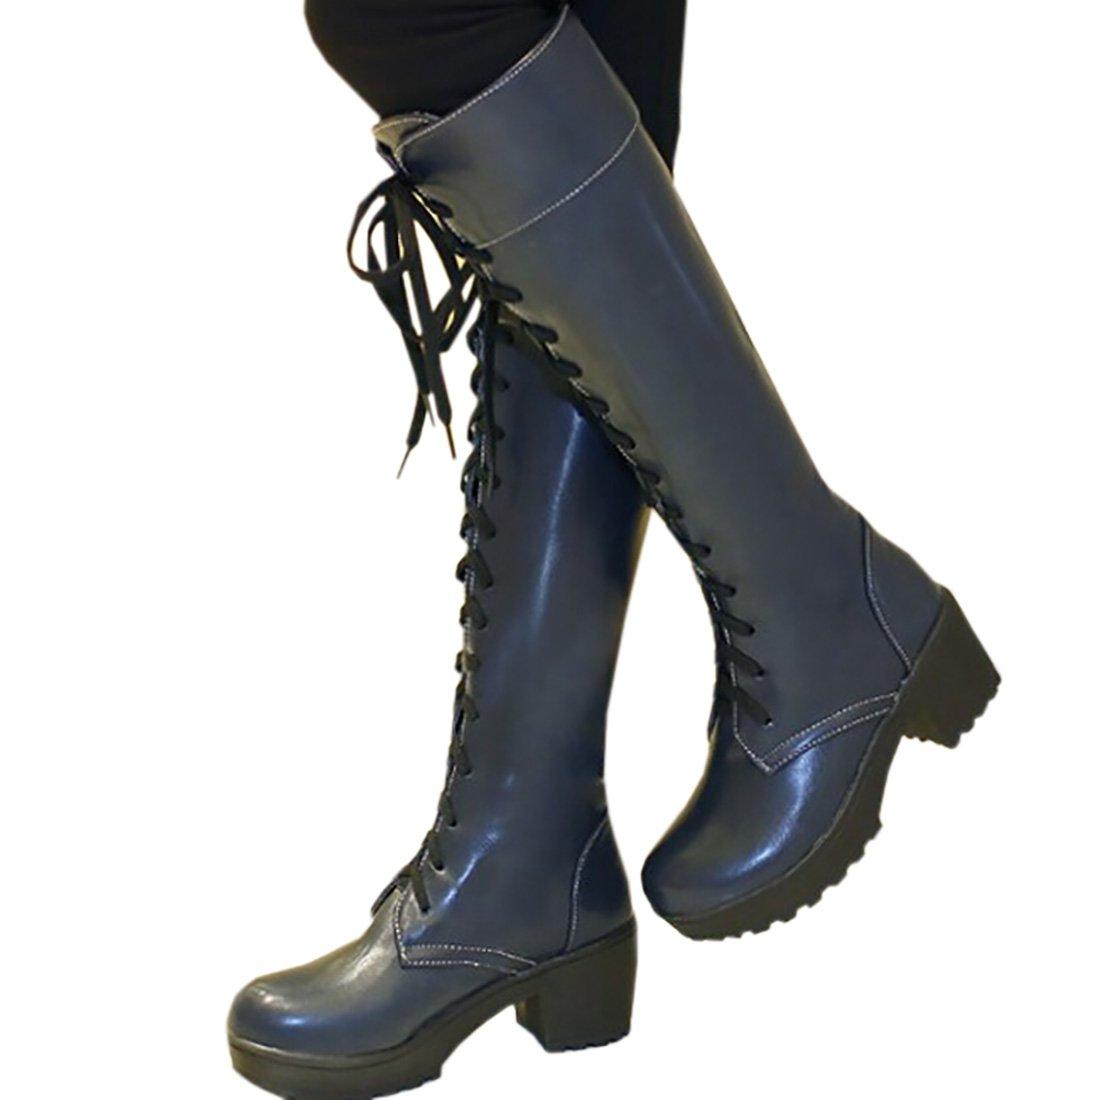 Partiss Damen Round Toe up Lace up Toe Zipper High-top PU Lolita Stiefel Lolita Stiefel Prinzessin Stiefel Schlupfstiefel Blau aeded6